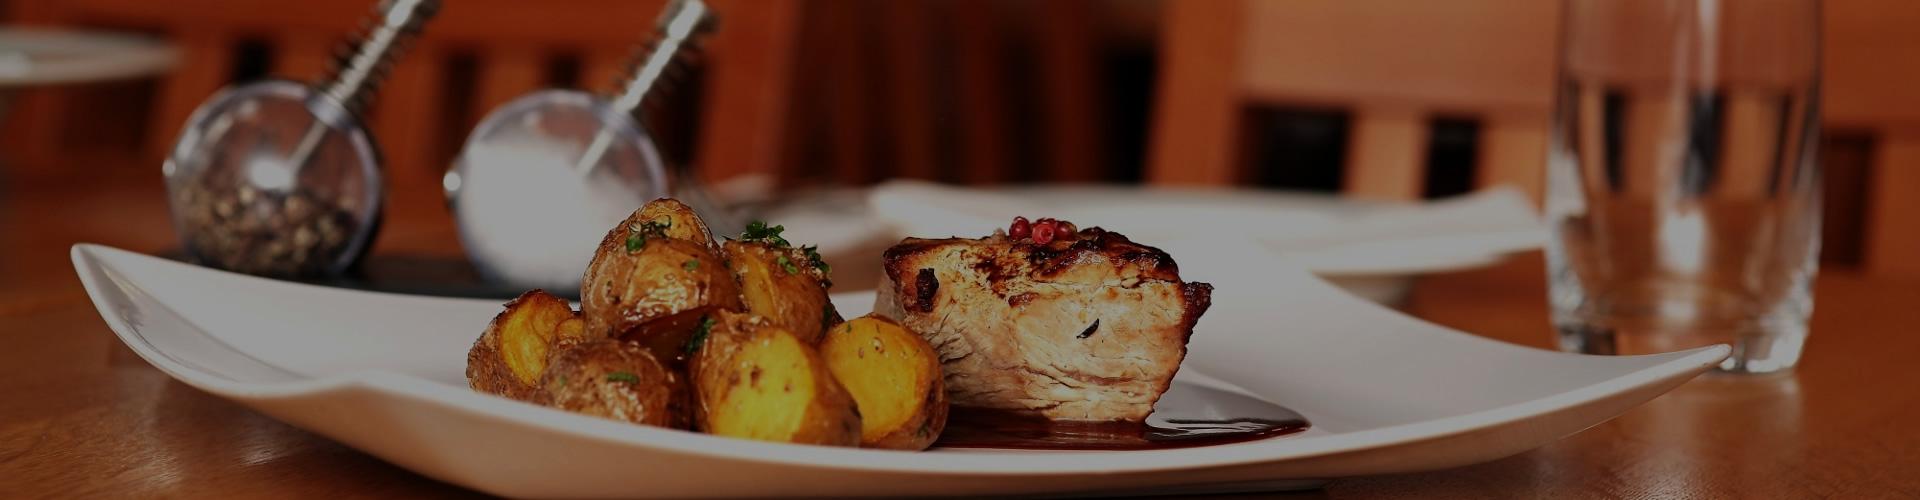 Online nabídka restaurace Statek 1738